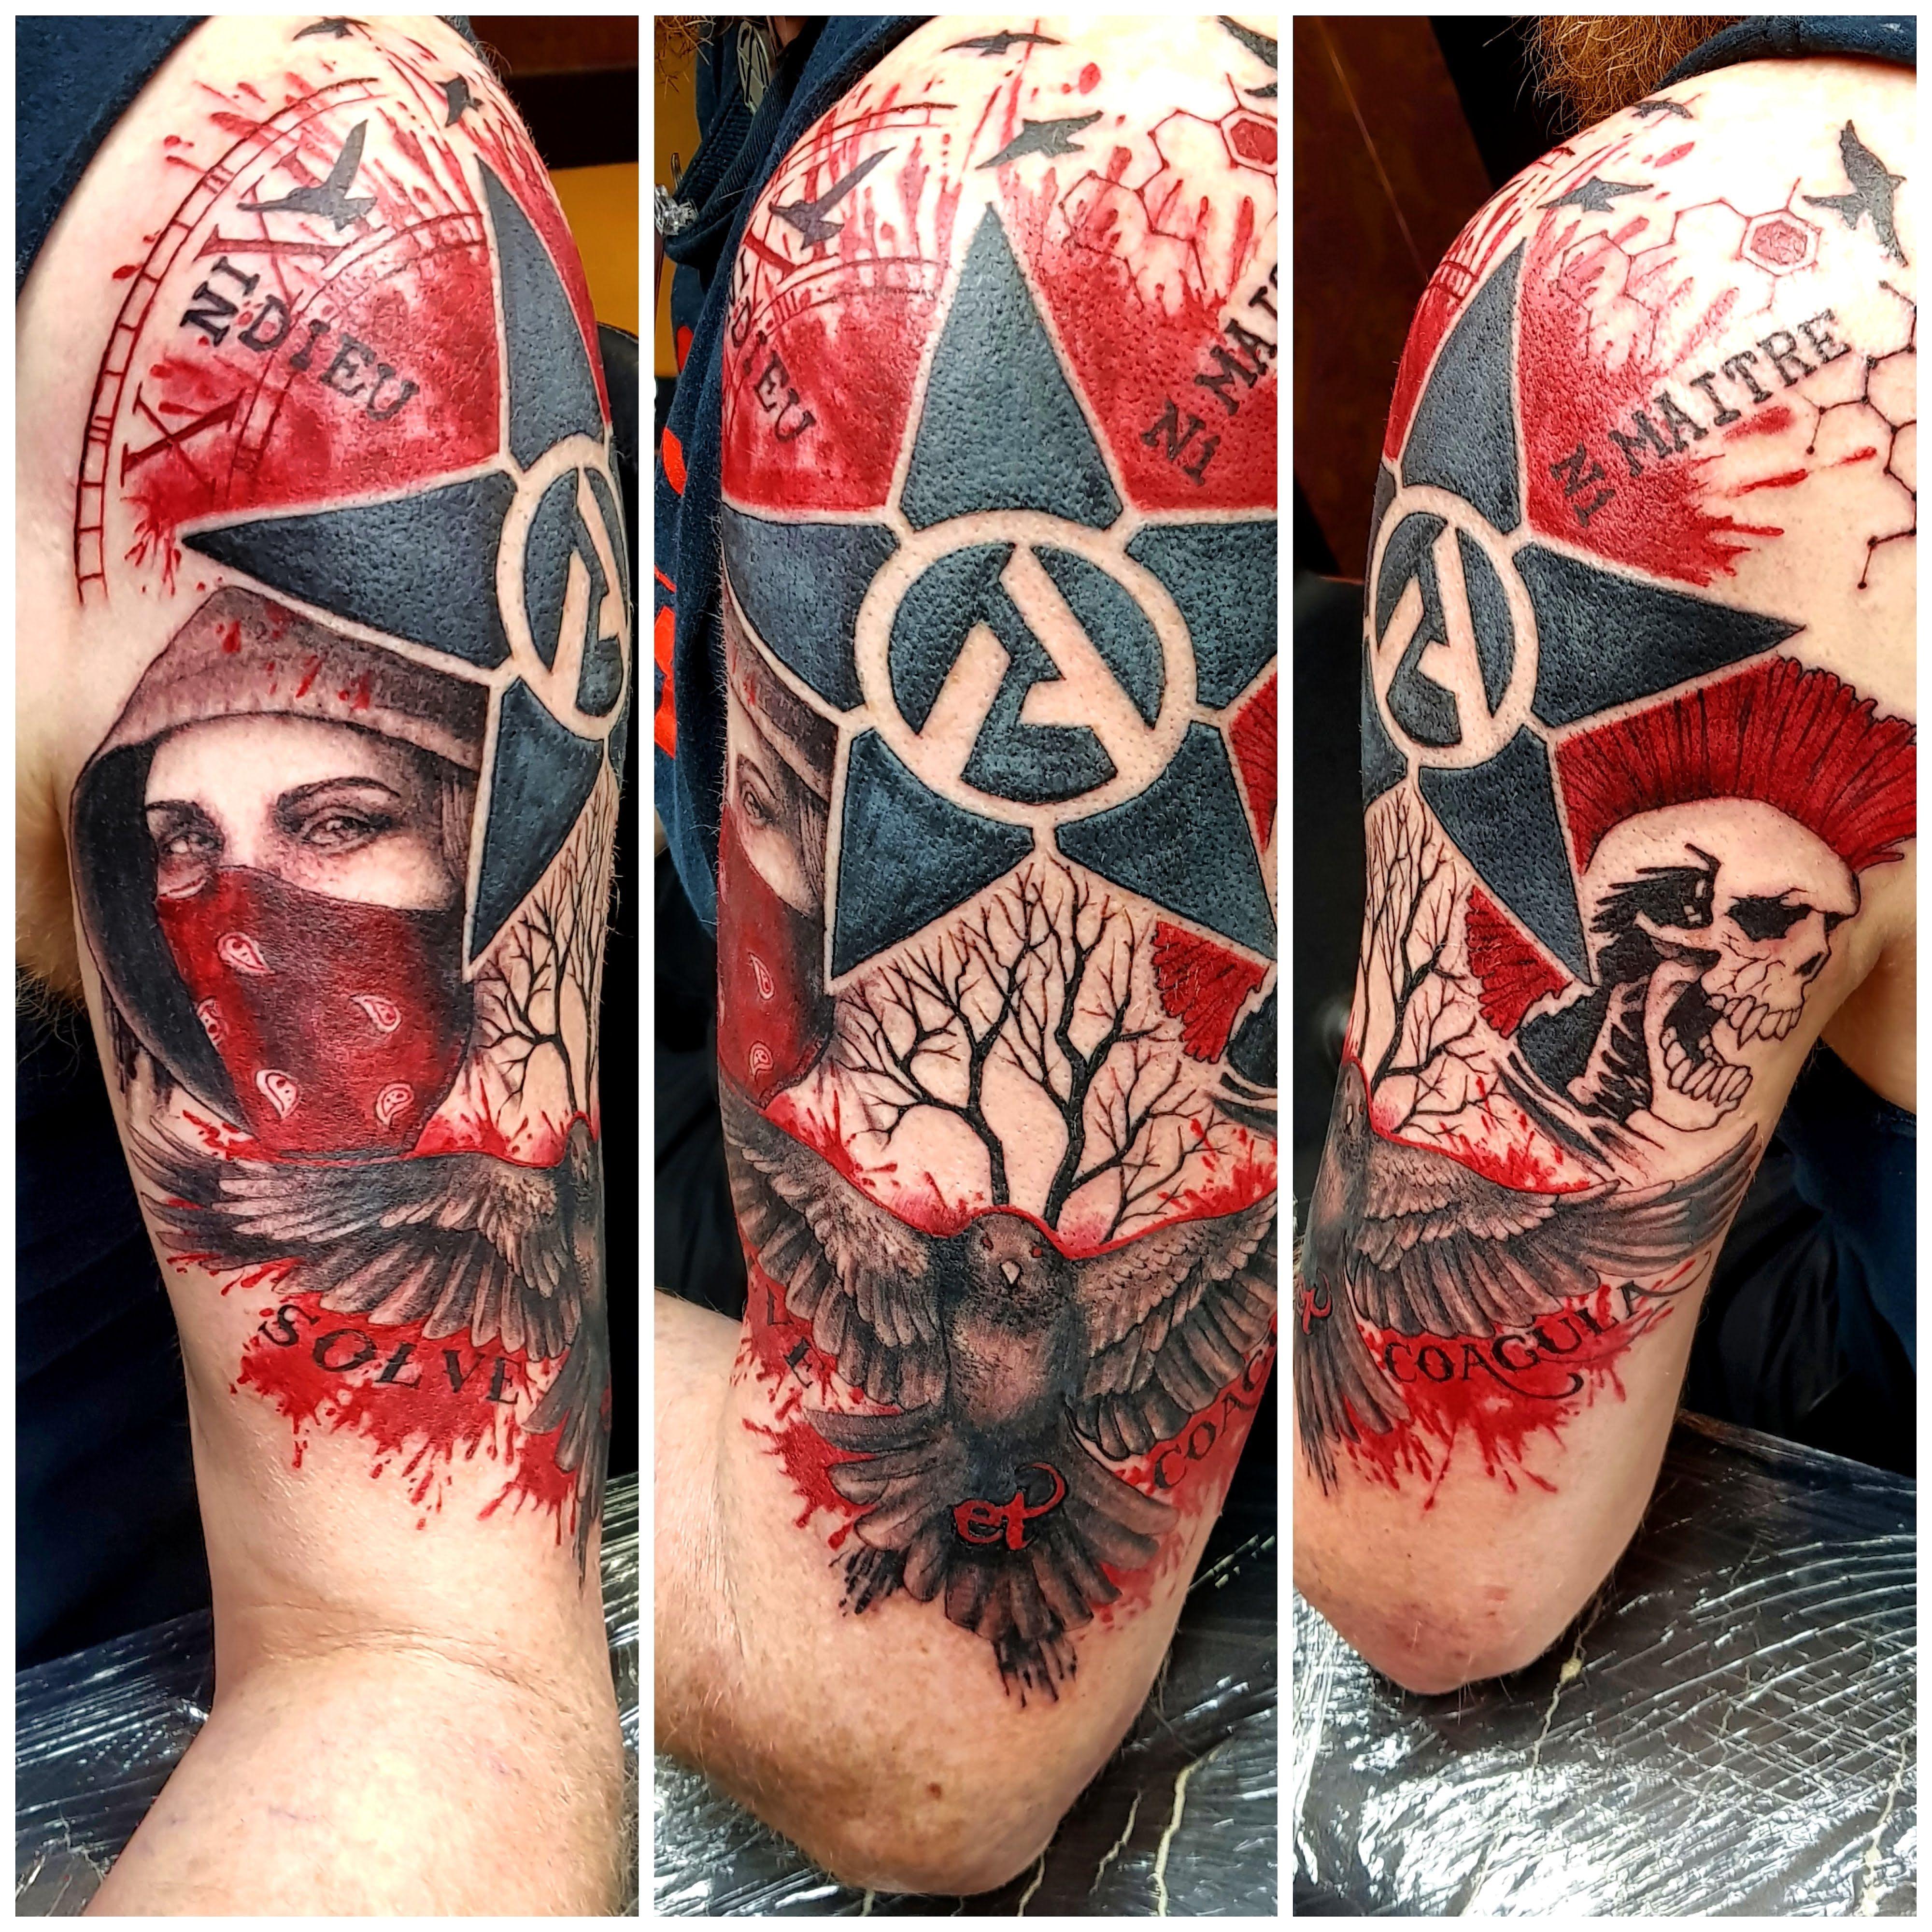 My Latest Tatt A Trash Polka Revolutionary Anarchist Punk Vibe That Incorporates Elements Of My Music Politics He Trash Polka Punk Tattoo Anarchist Tattoo